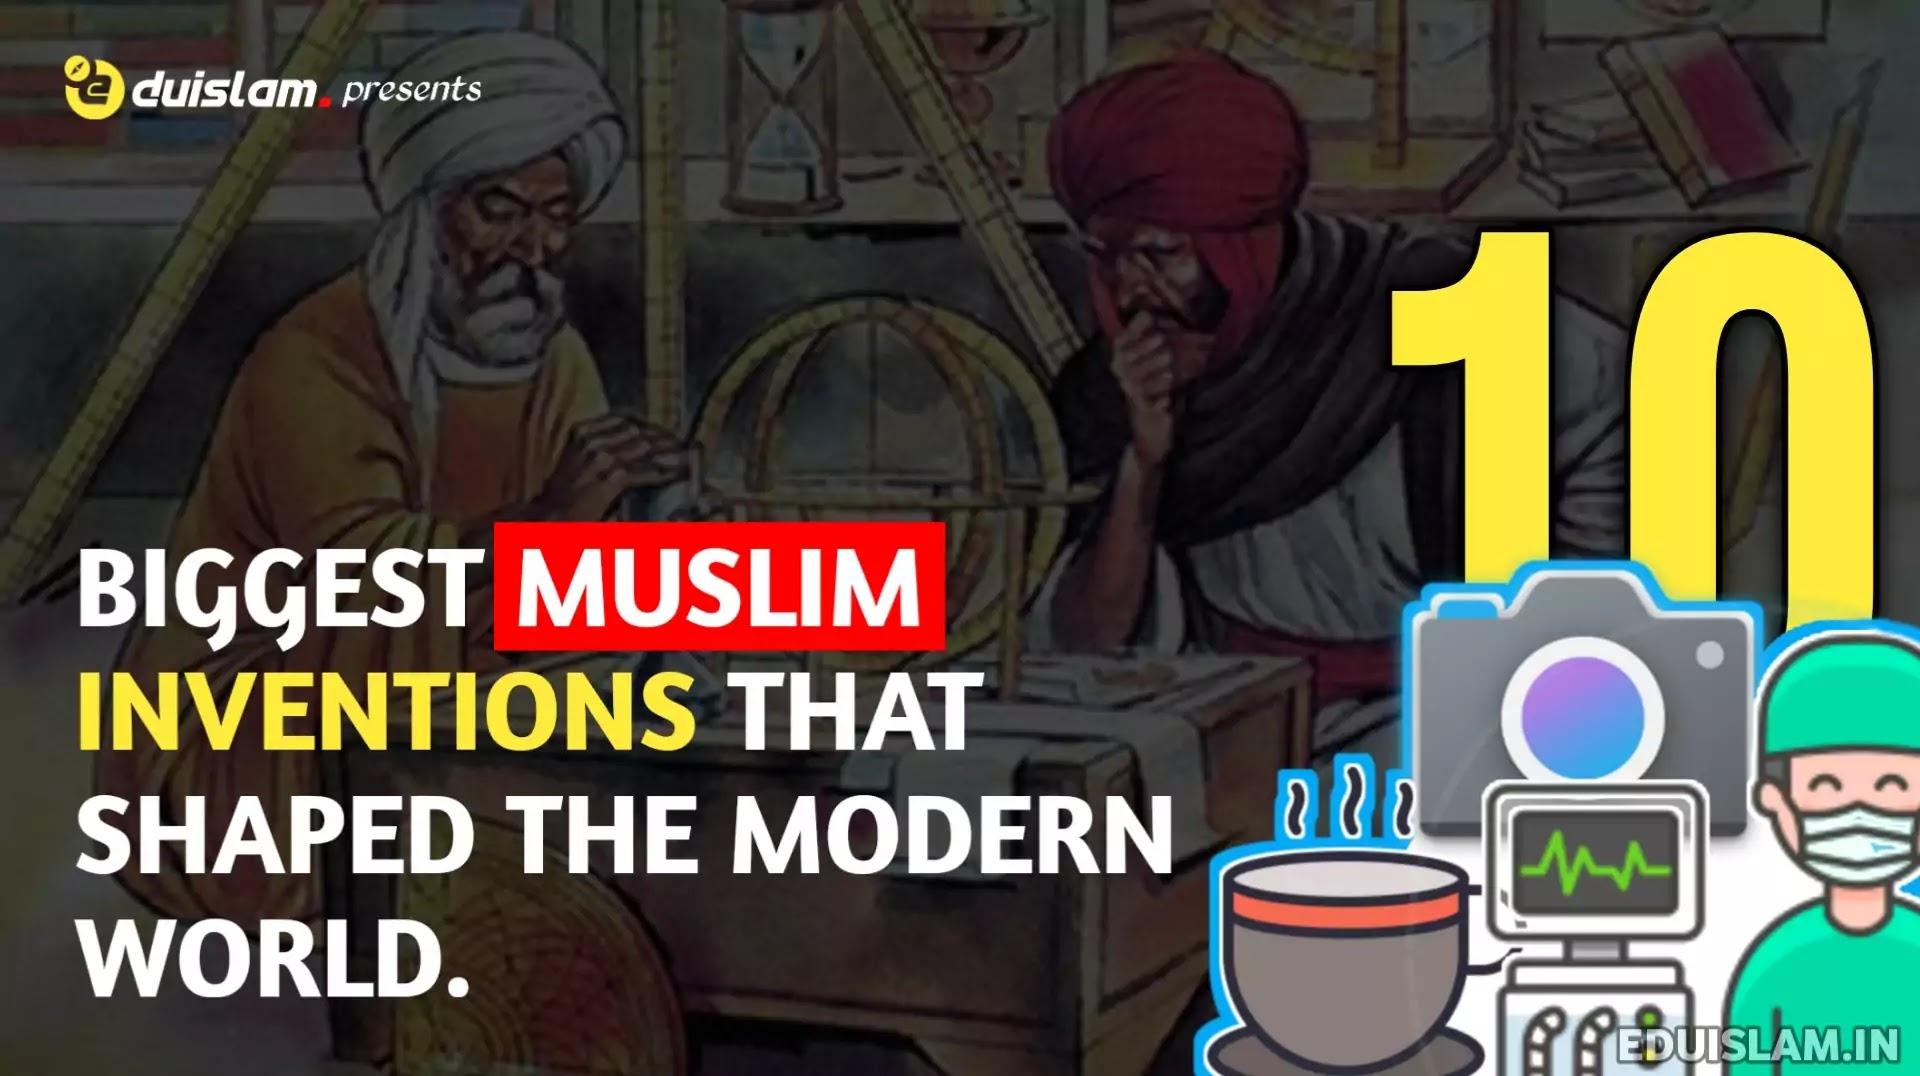 Muslim inventions